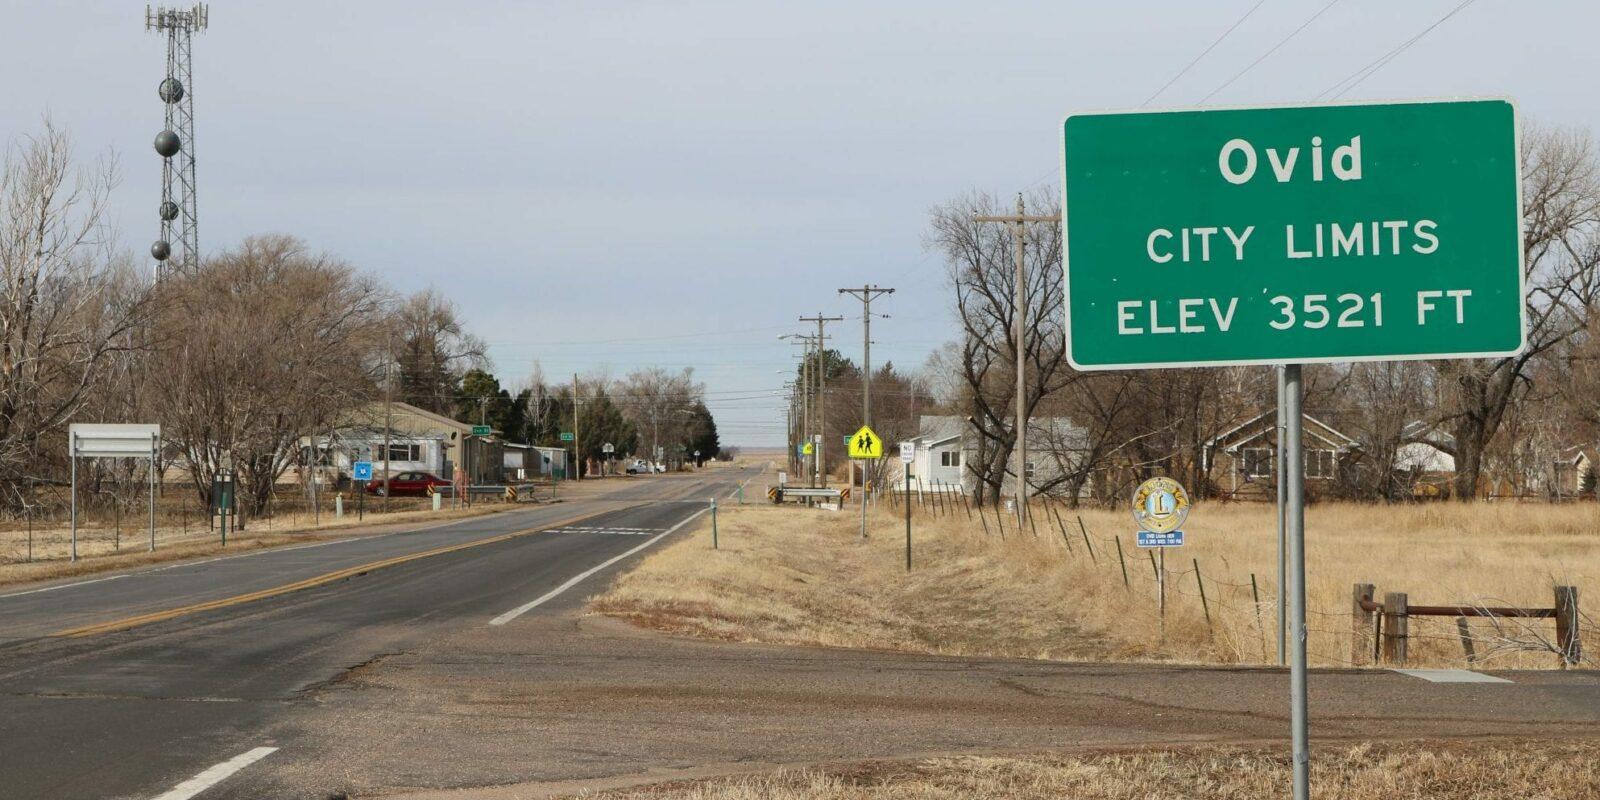 image of Ovid Colorado